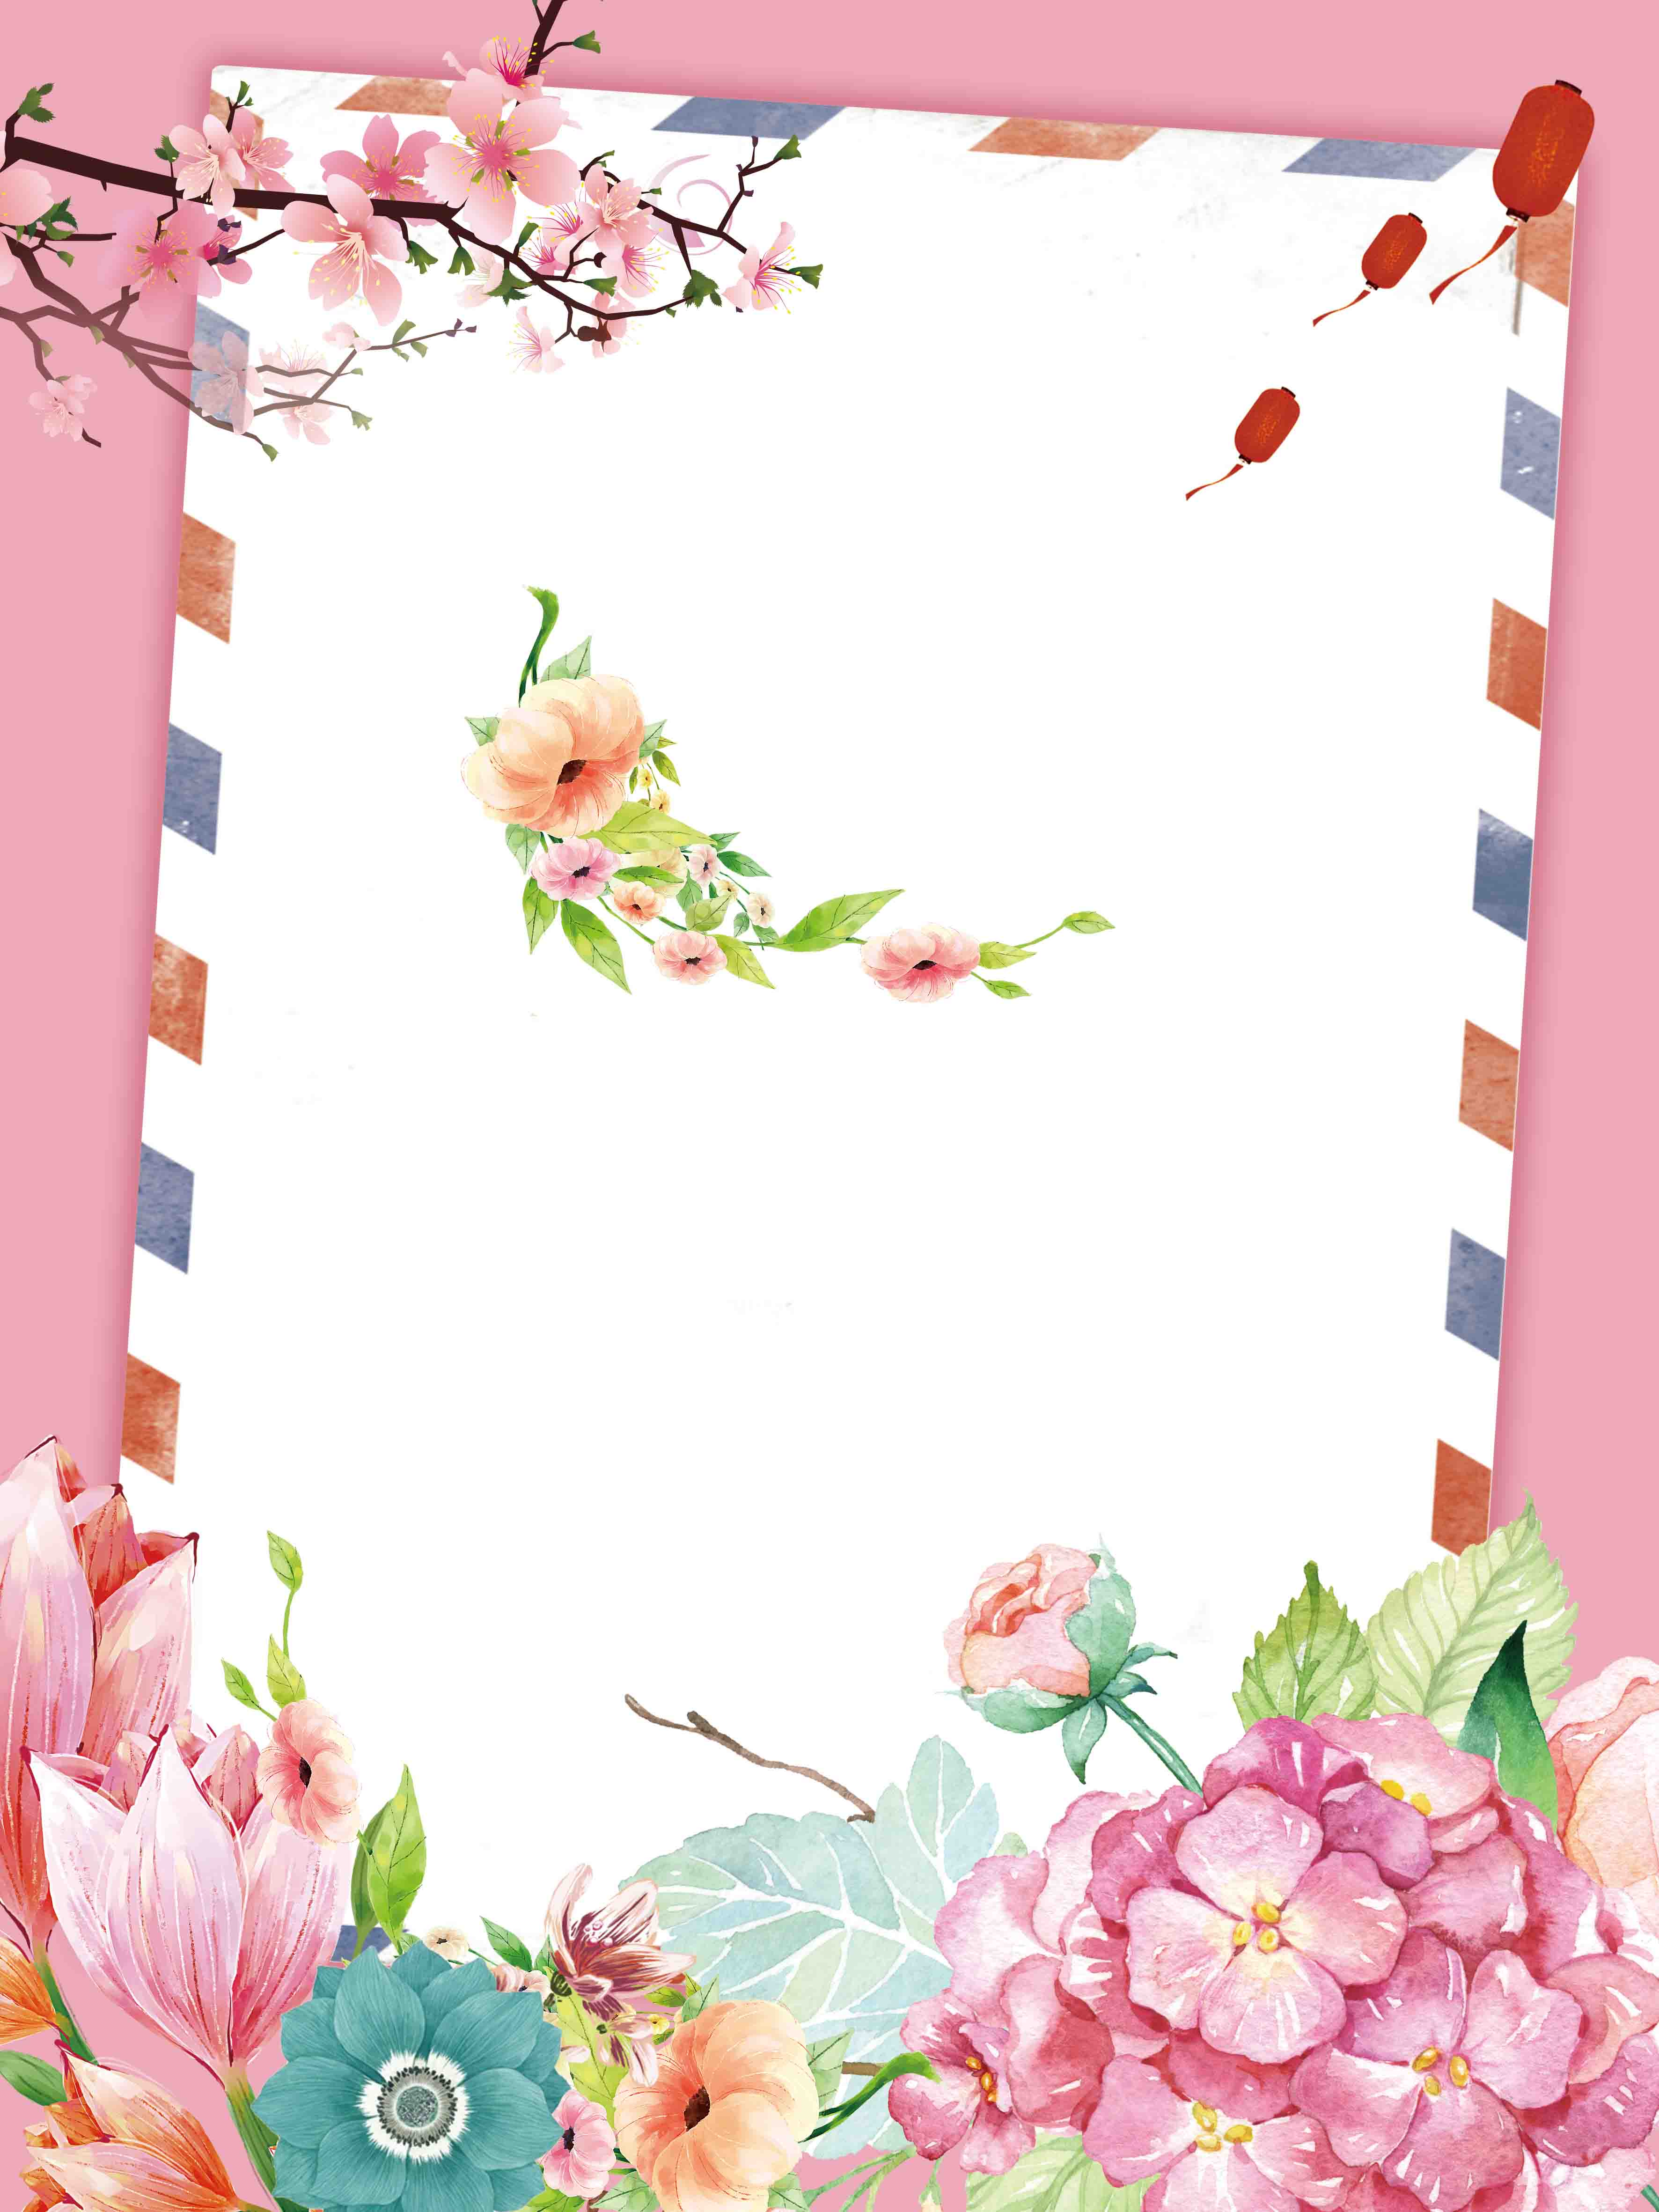 Image Result For Design Of Teachers Day Card